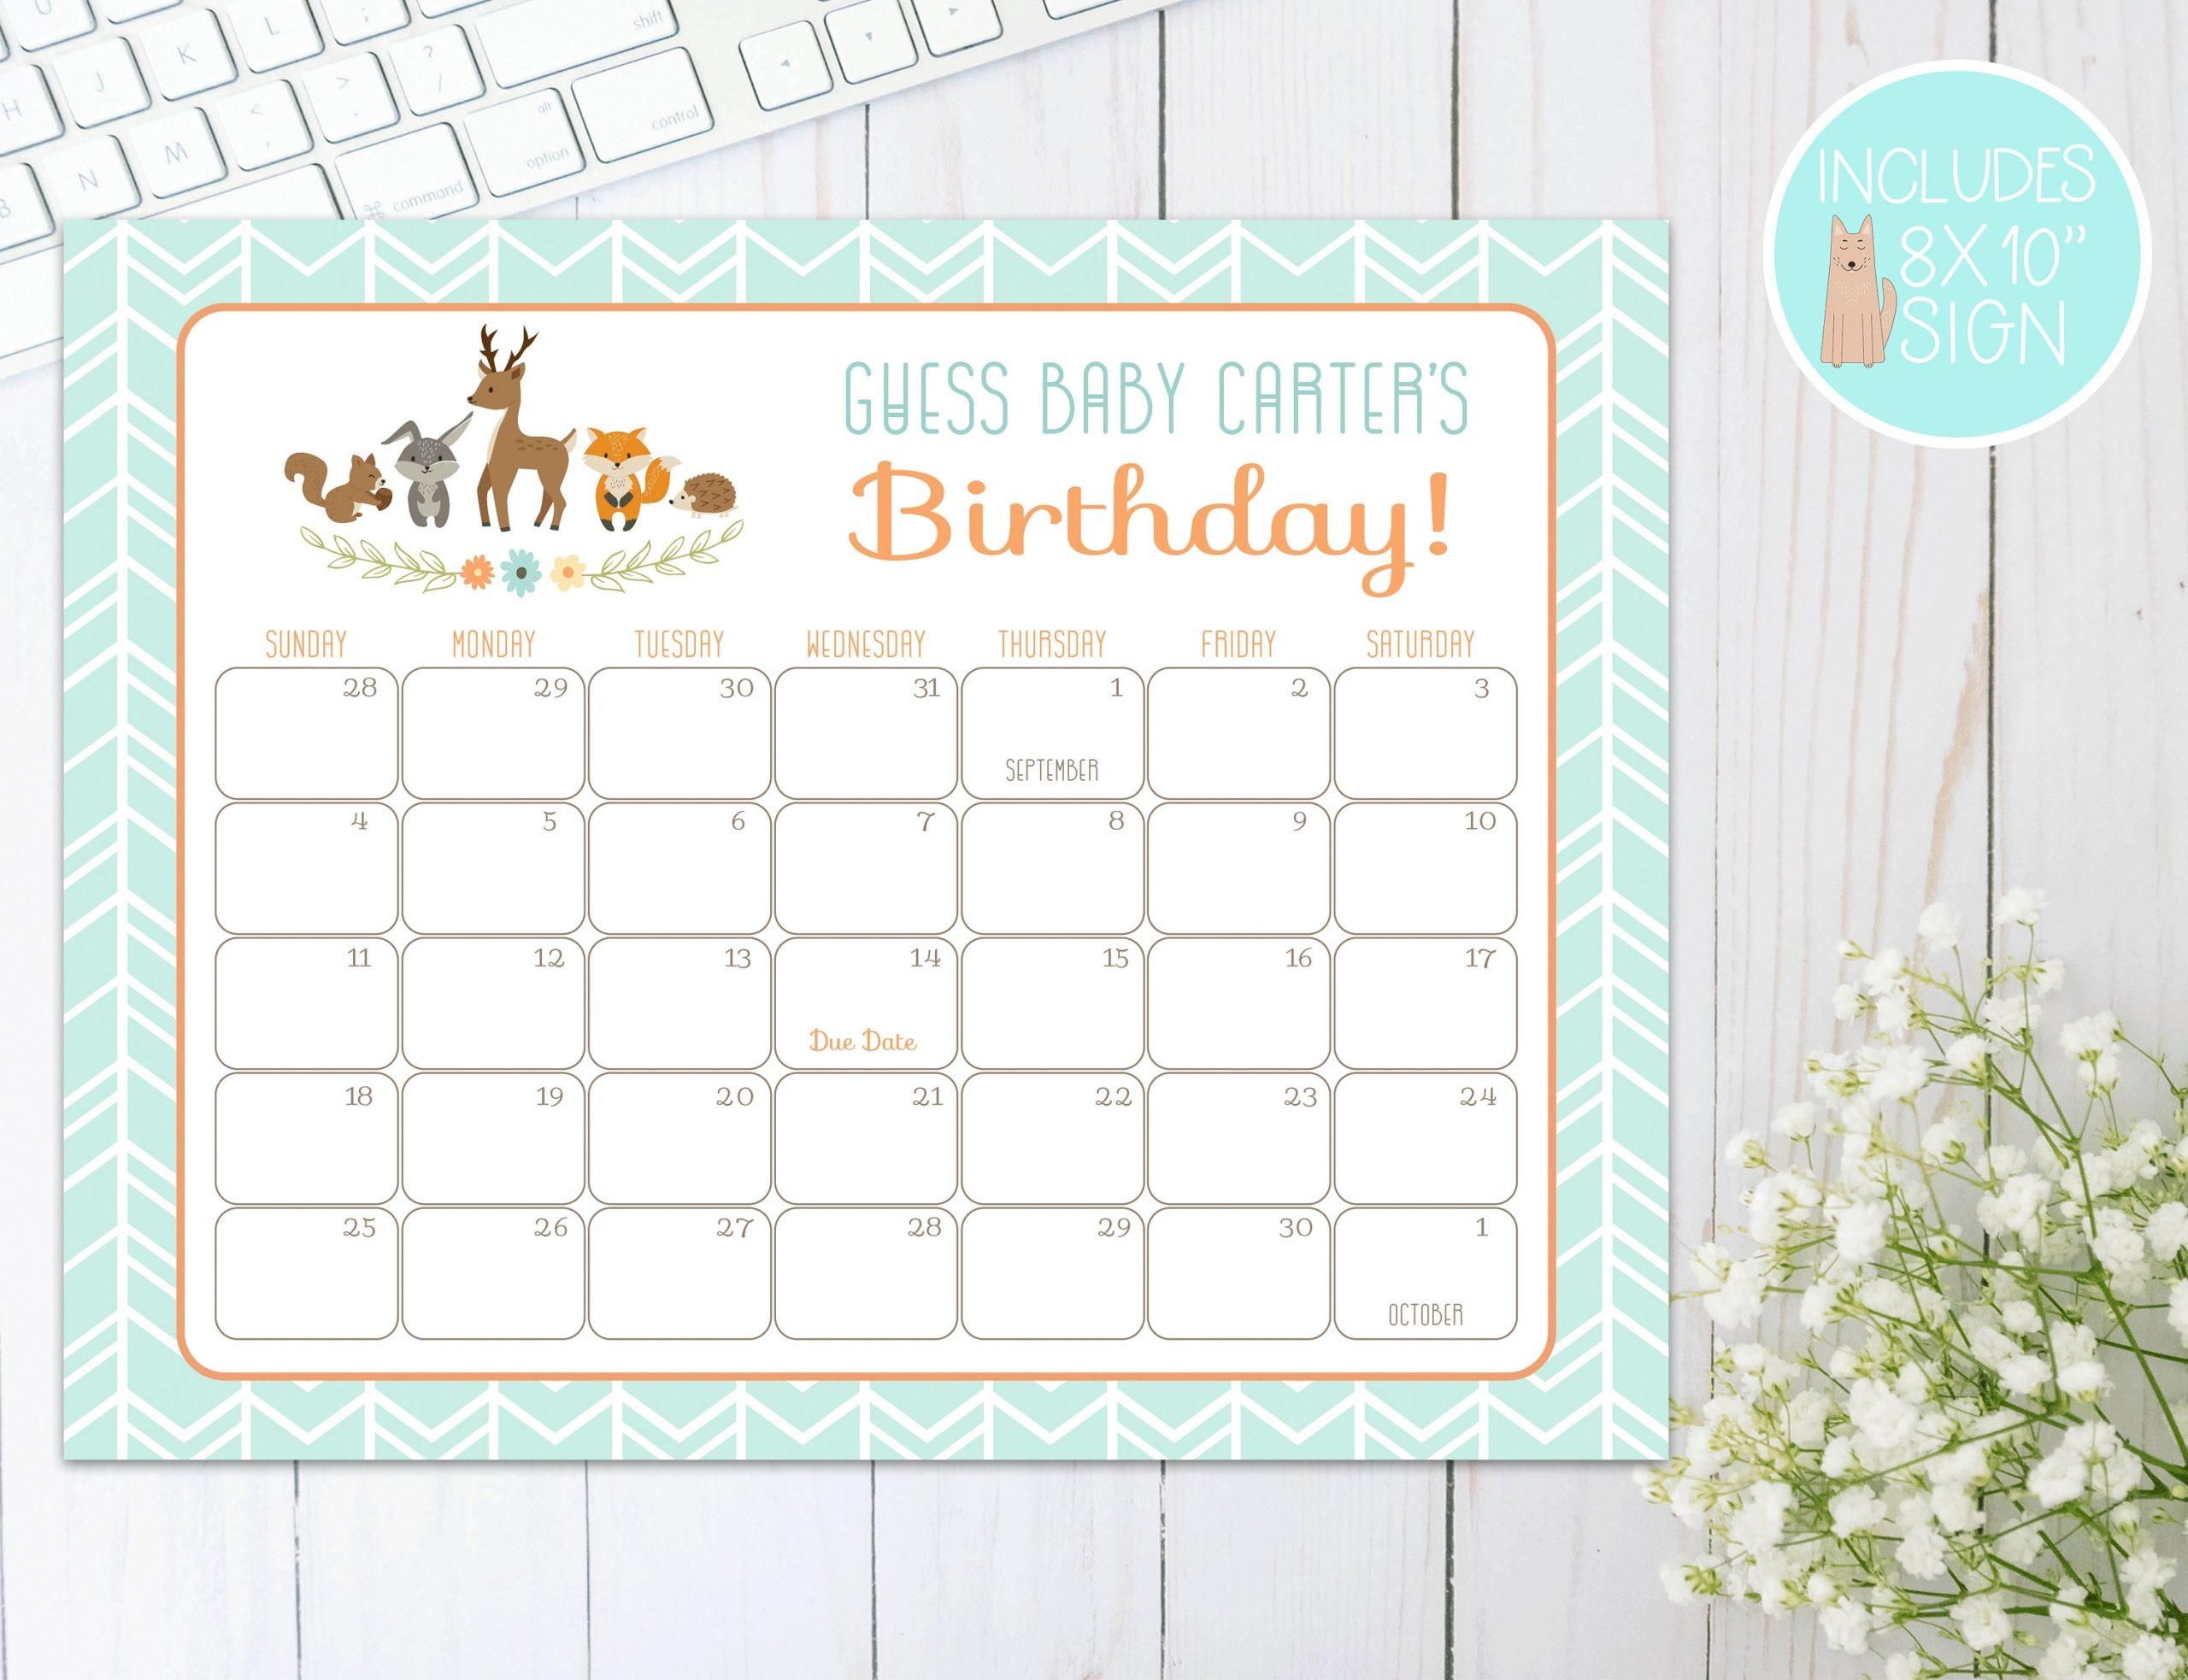 Woodland Baby Shower Due Date Calendar   Prediction Calendar   Guess Baby'S  Birthday   Baby Shower Games, Decorations   Deer, Fox, Rabbit